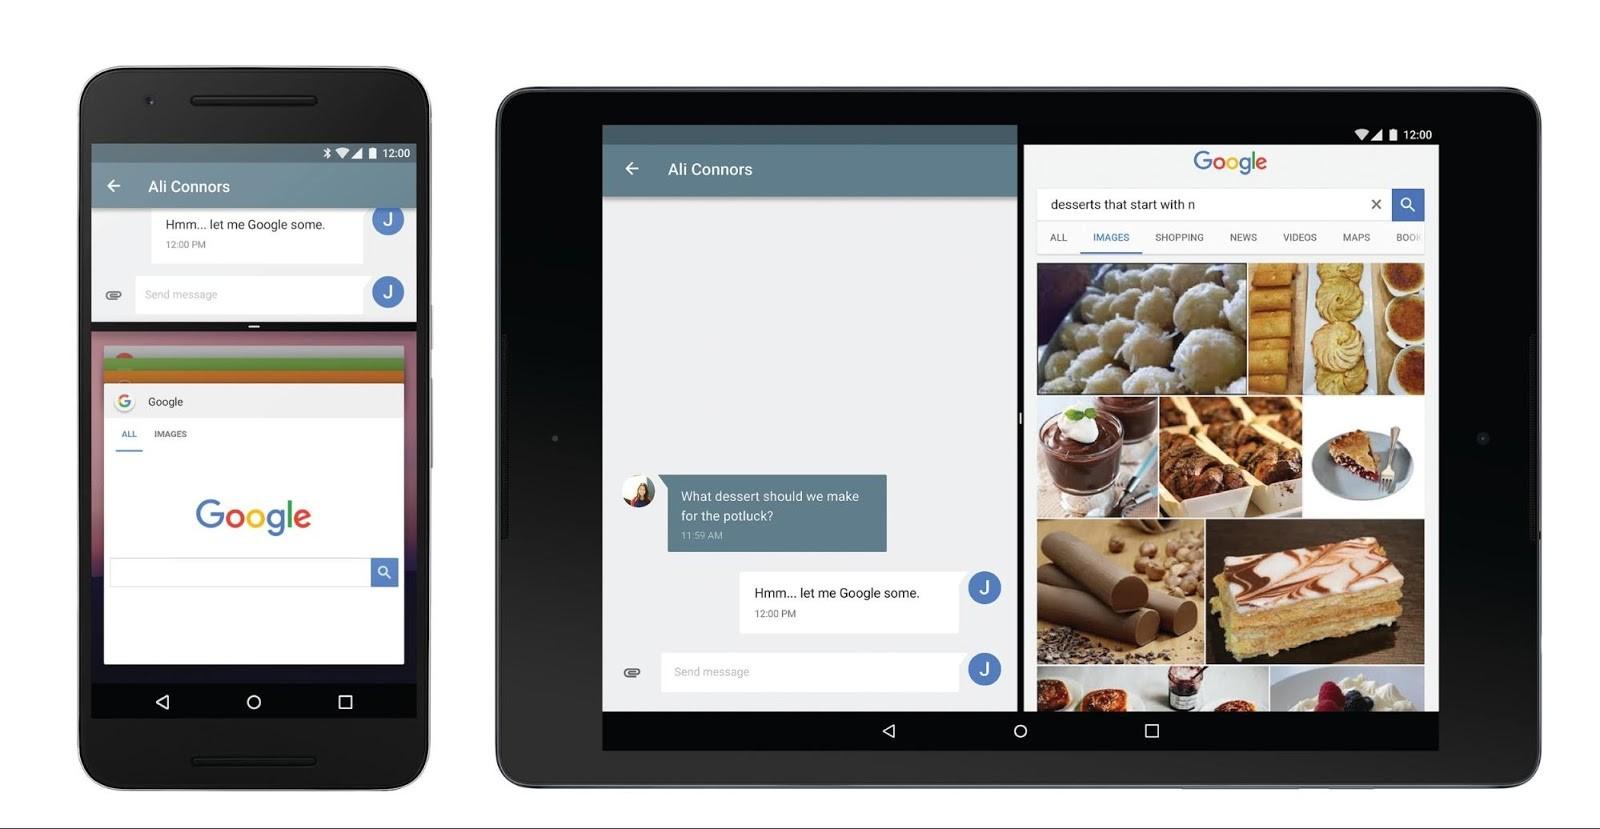 Android N multitasking